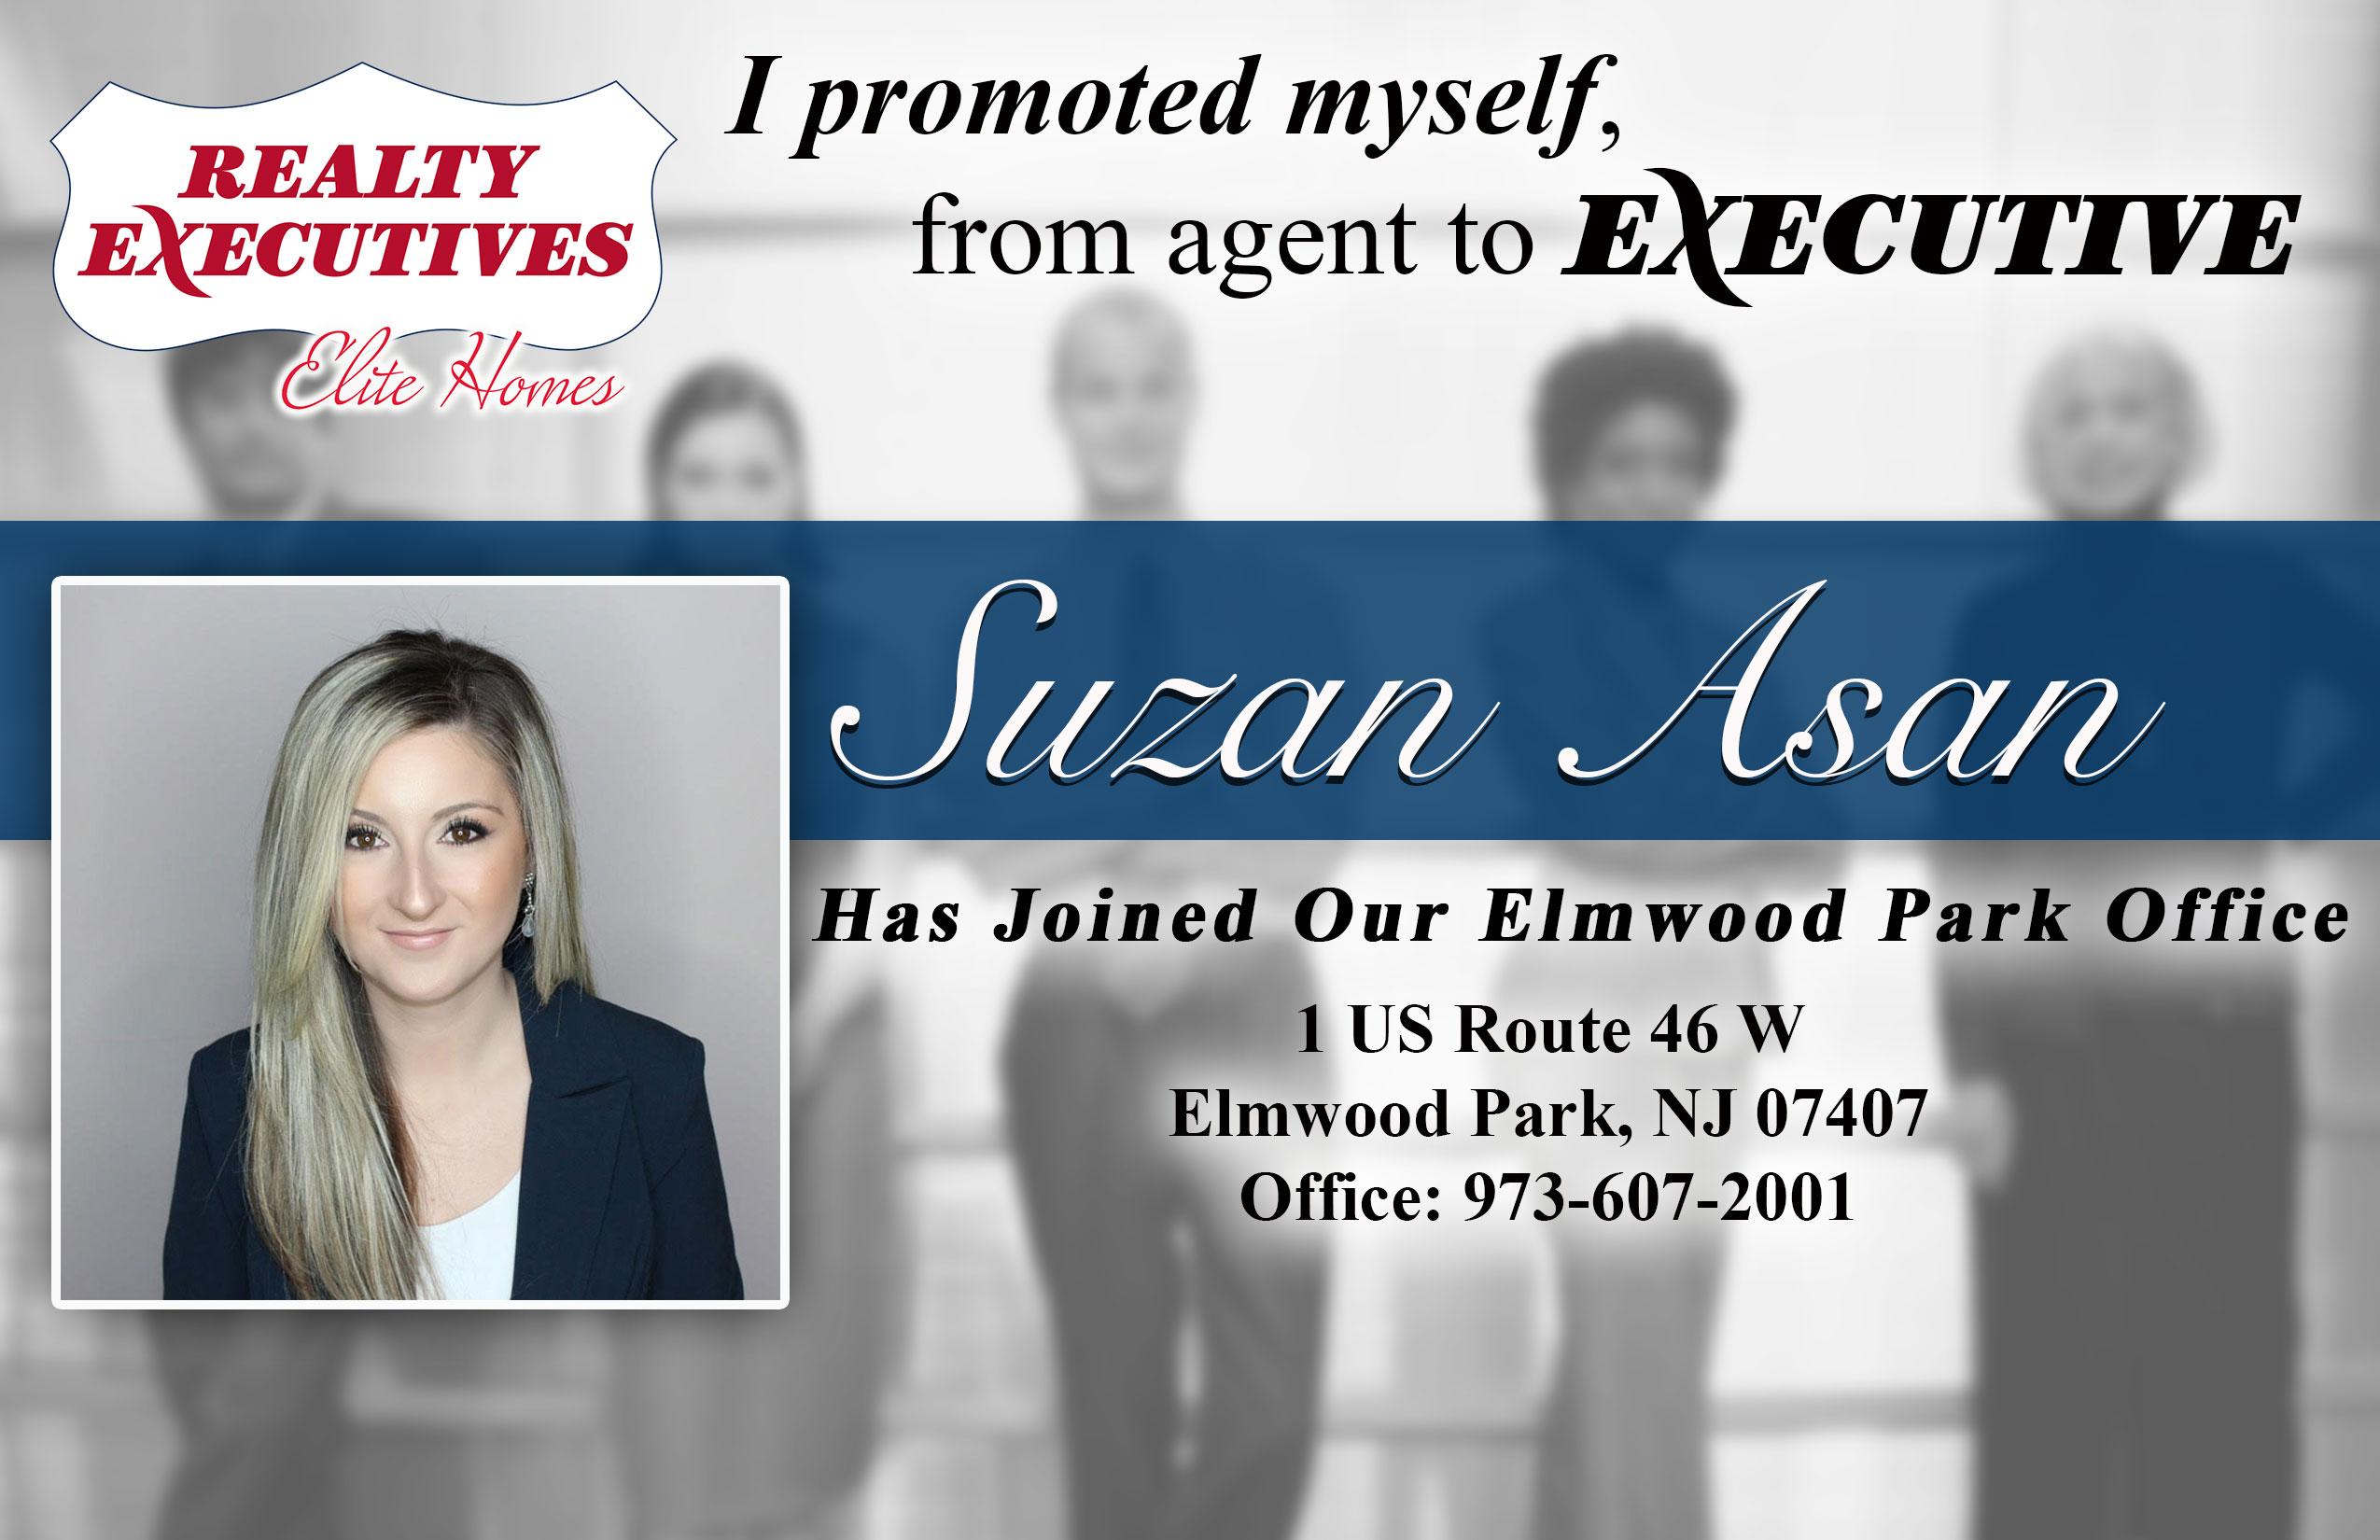 Suzan Asan Joins Realty Executives Elite Homes